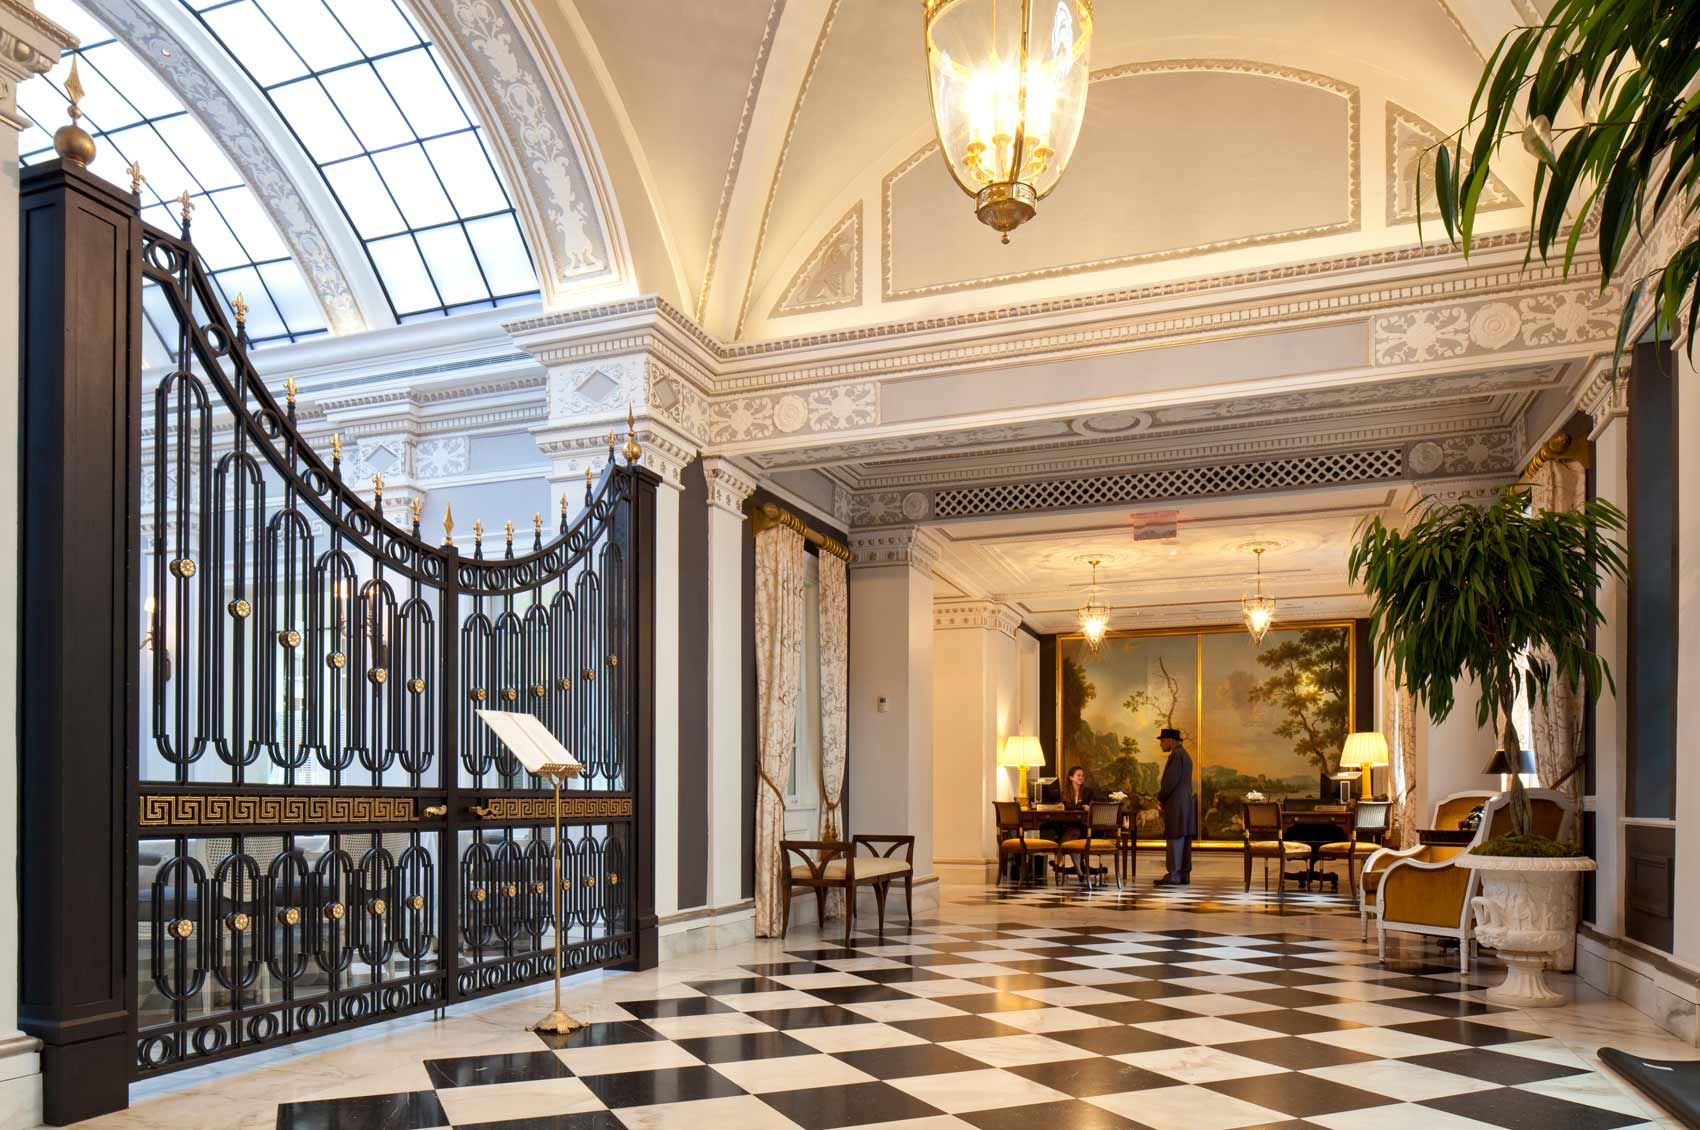 Vienna hotels fodor s - Vienna Hotels Fodor S 46